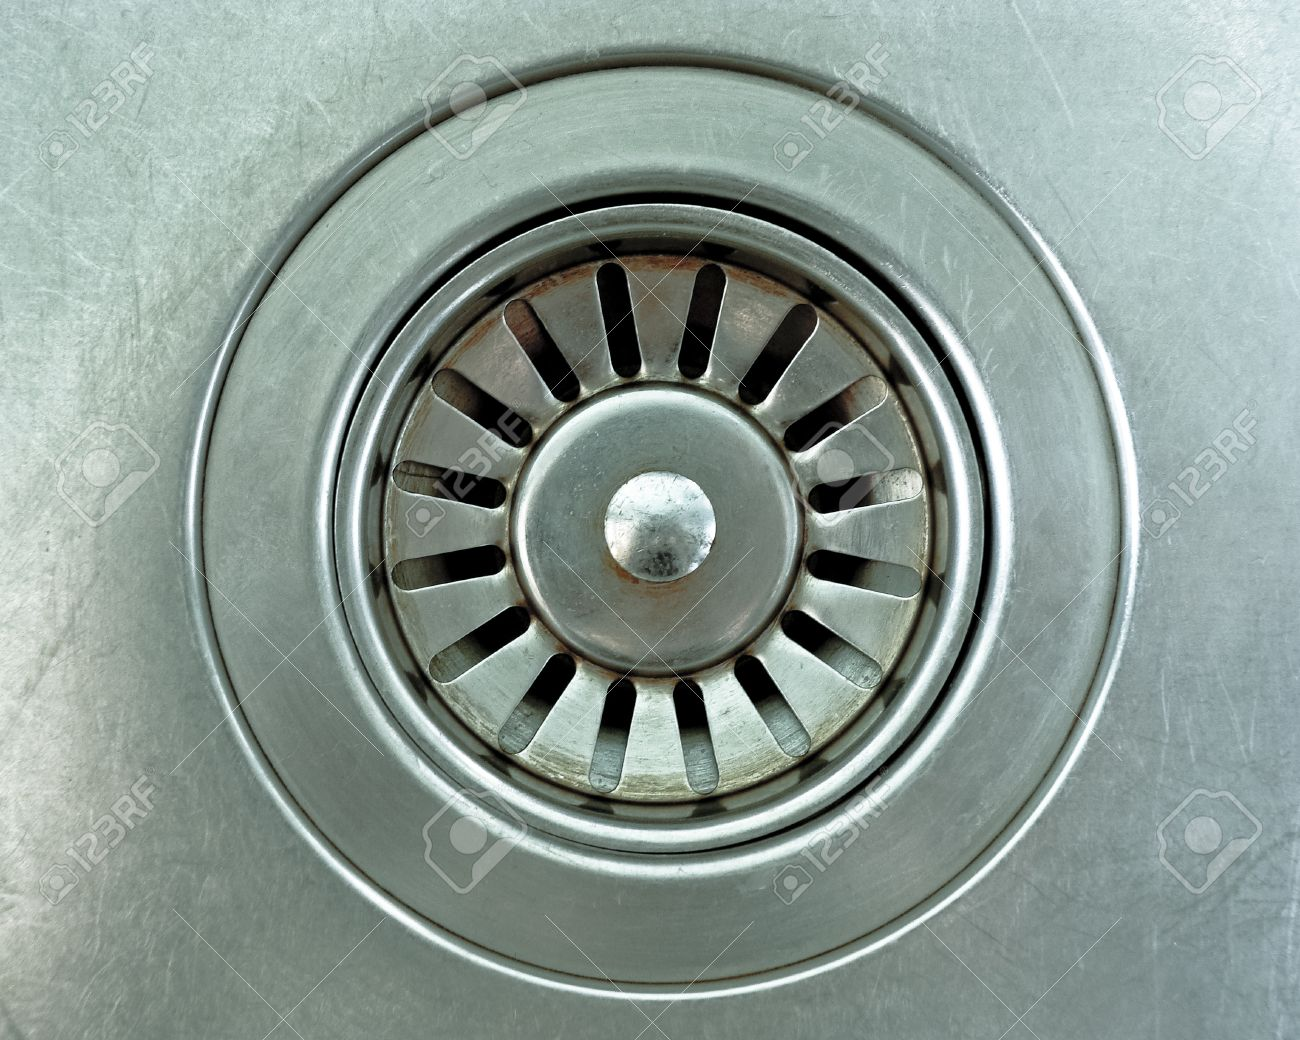 12984090 close up a drain hole metallic kitchen sink Stock Photo